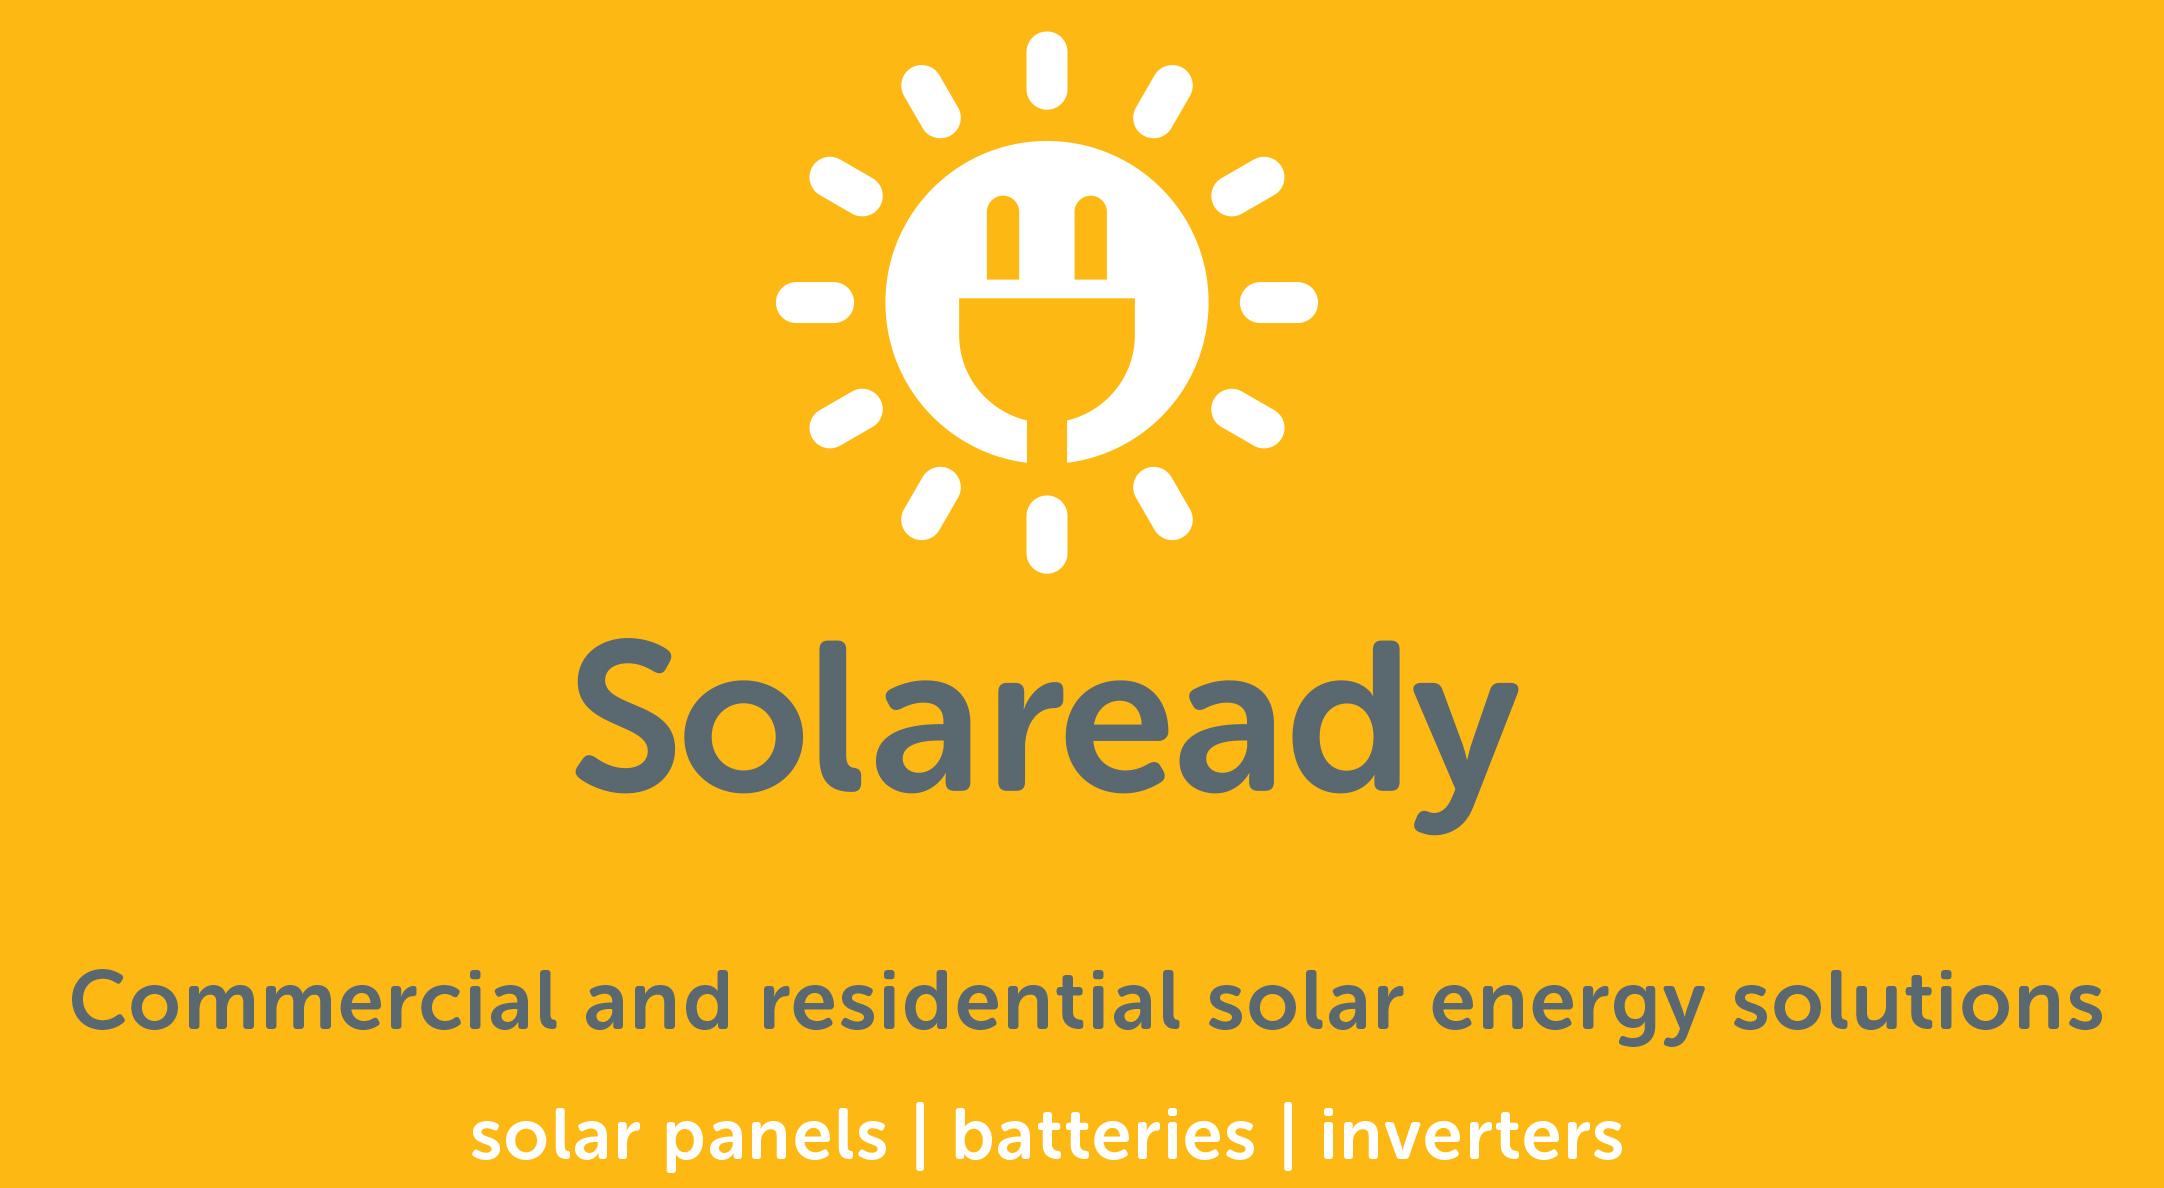 Solar Ready